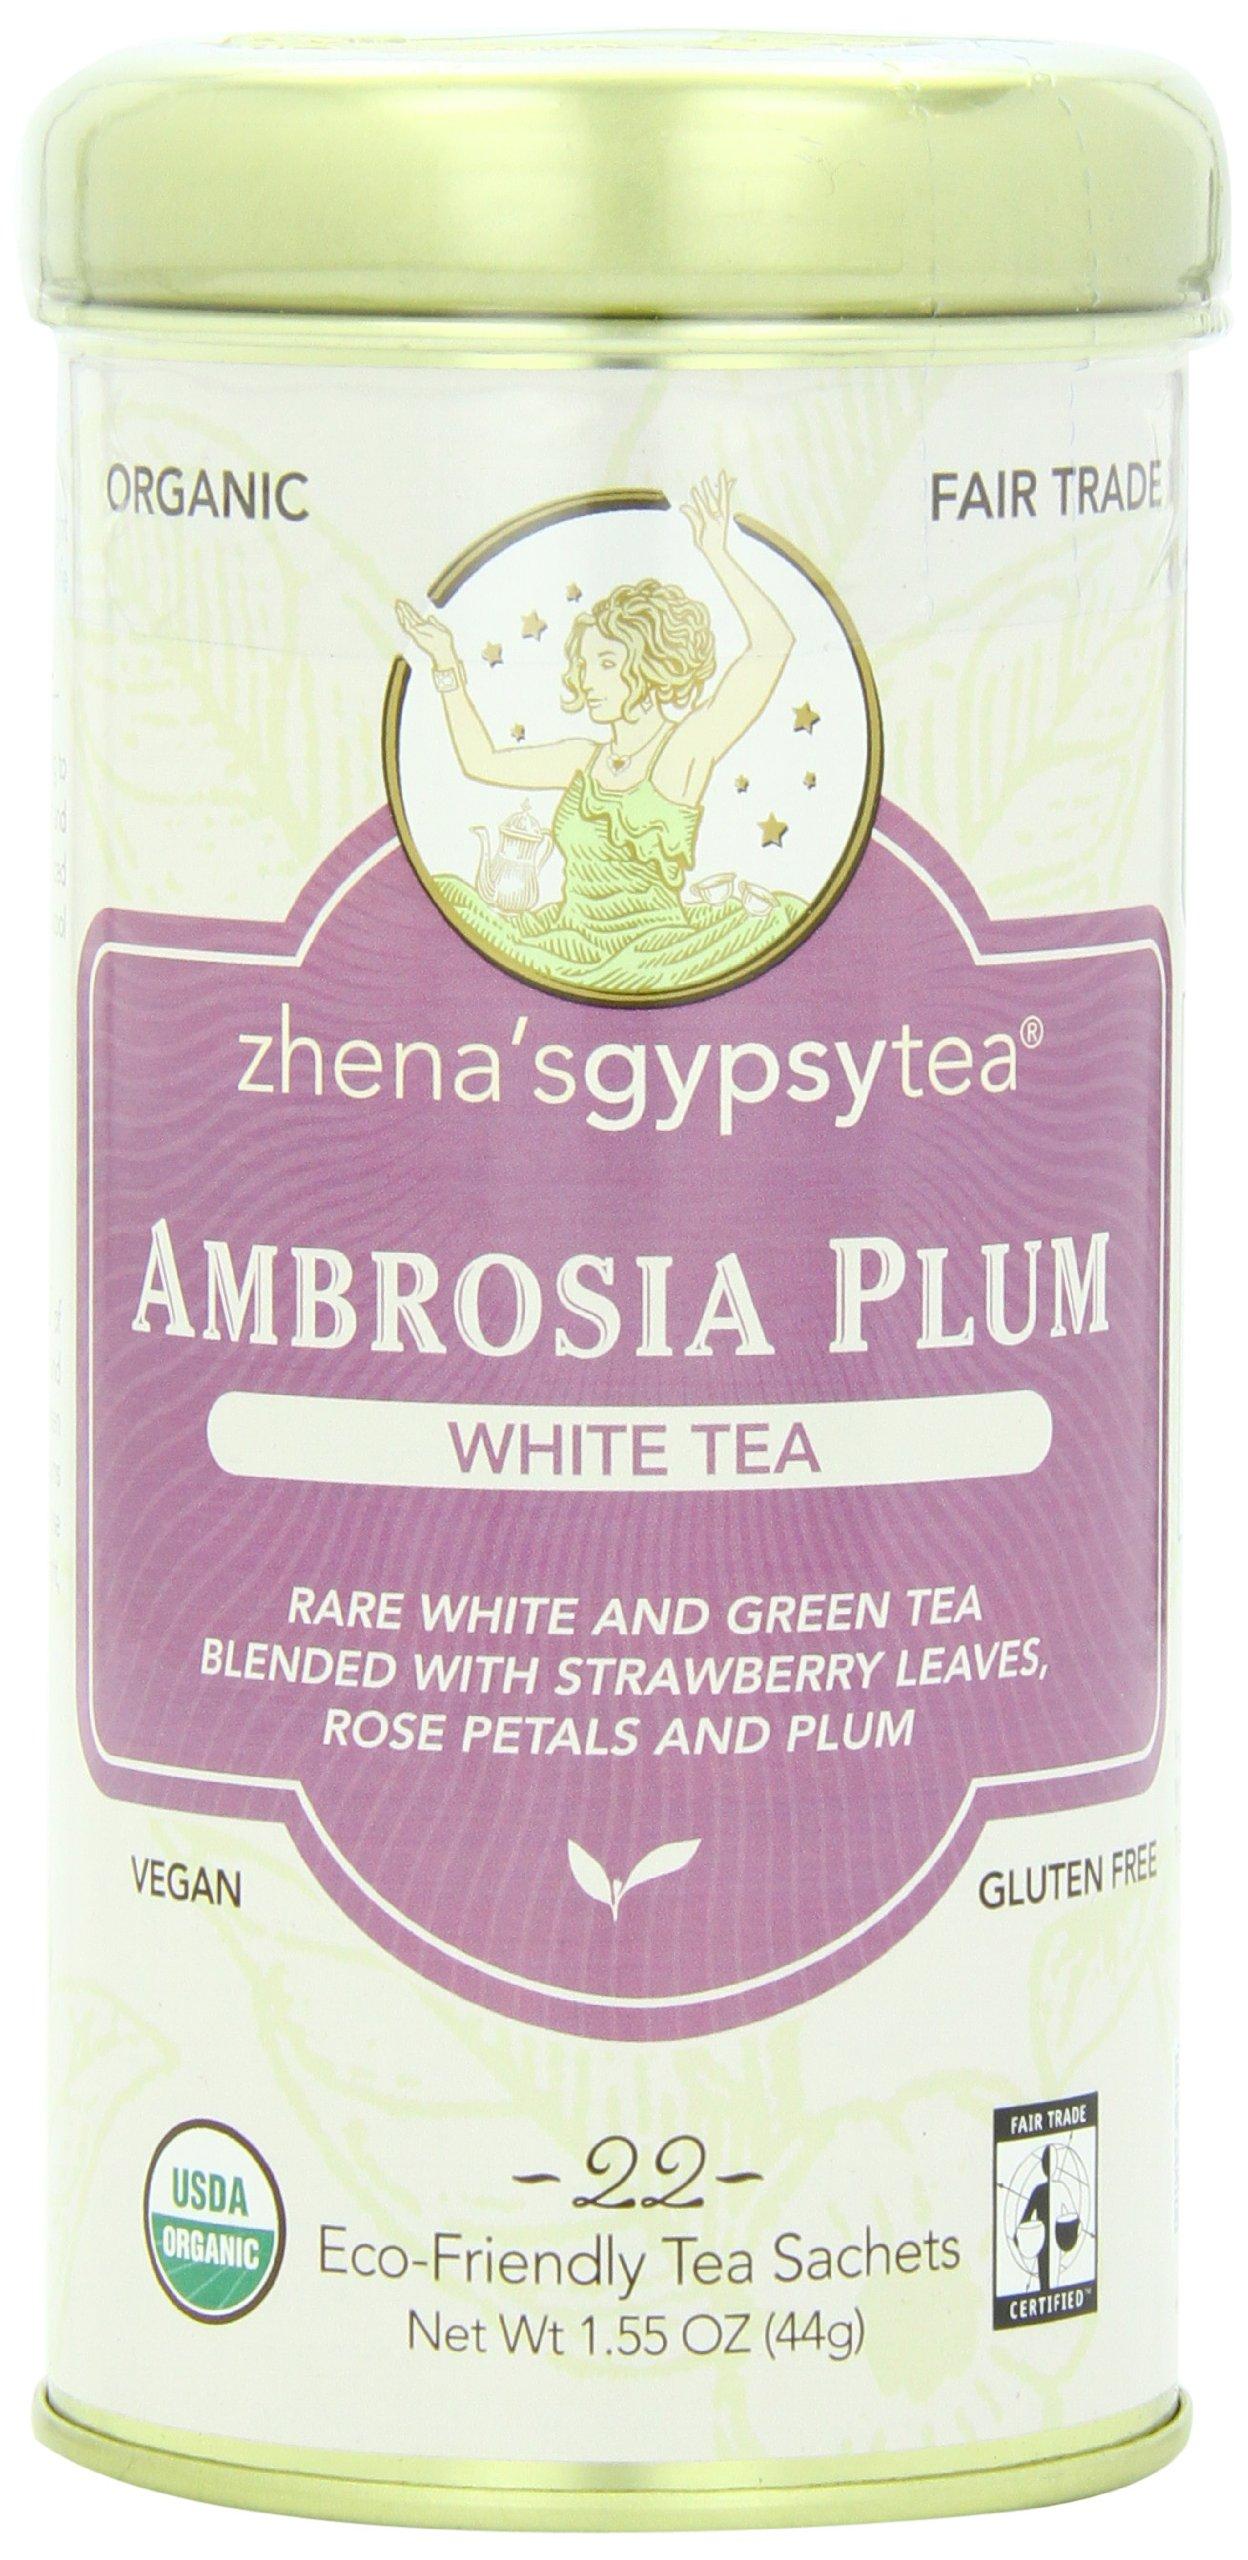 Zhena's Gypsy Tea, Ambrosia Plum, 22 Count Tea Sachet, 1.55 Oz